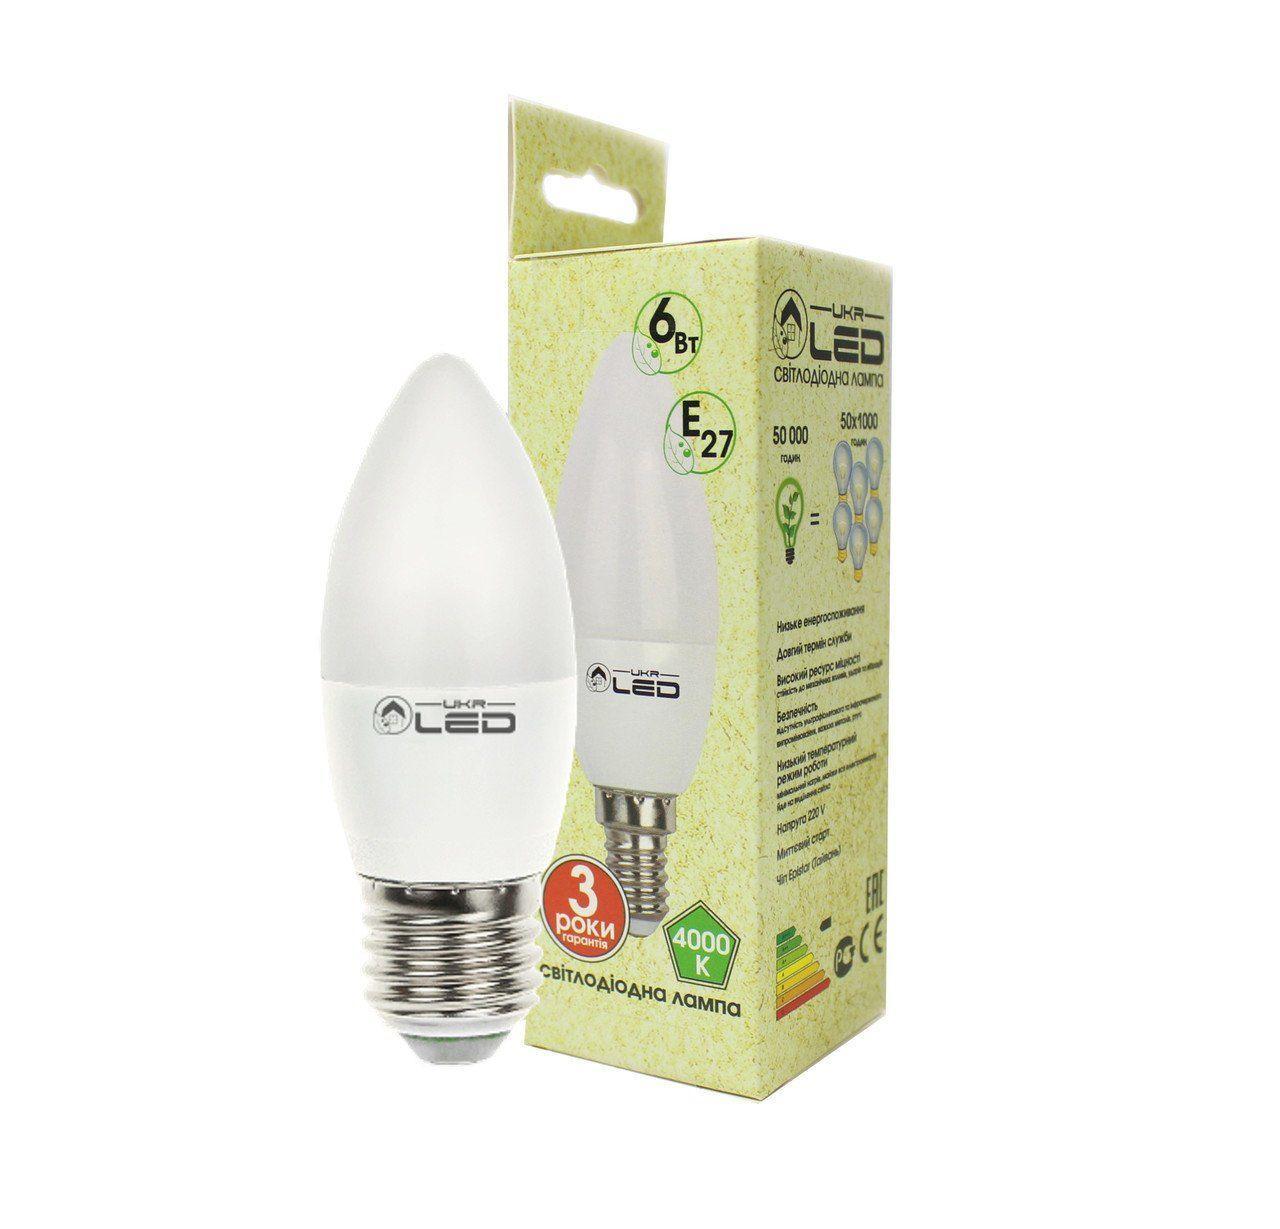 Светодиодная лампа UkrLed Е27 6W (Свеча) 4000К (184)